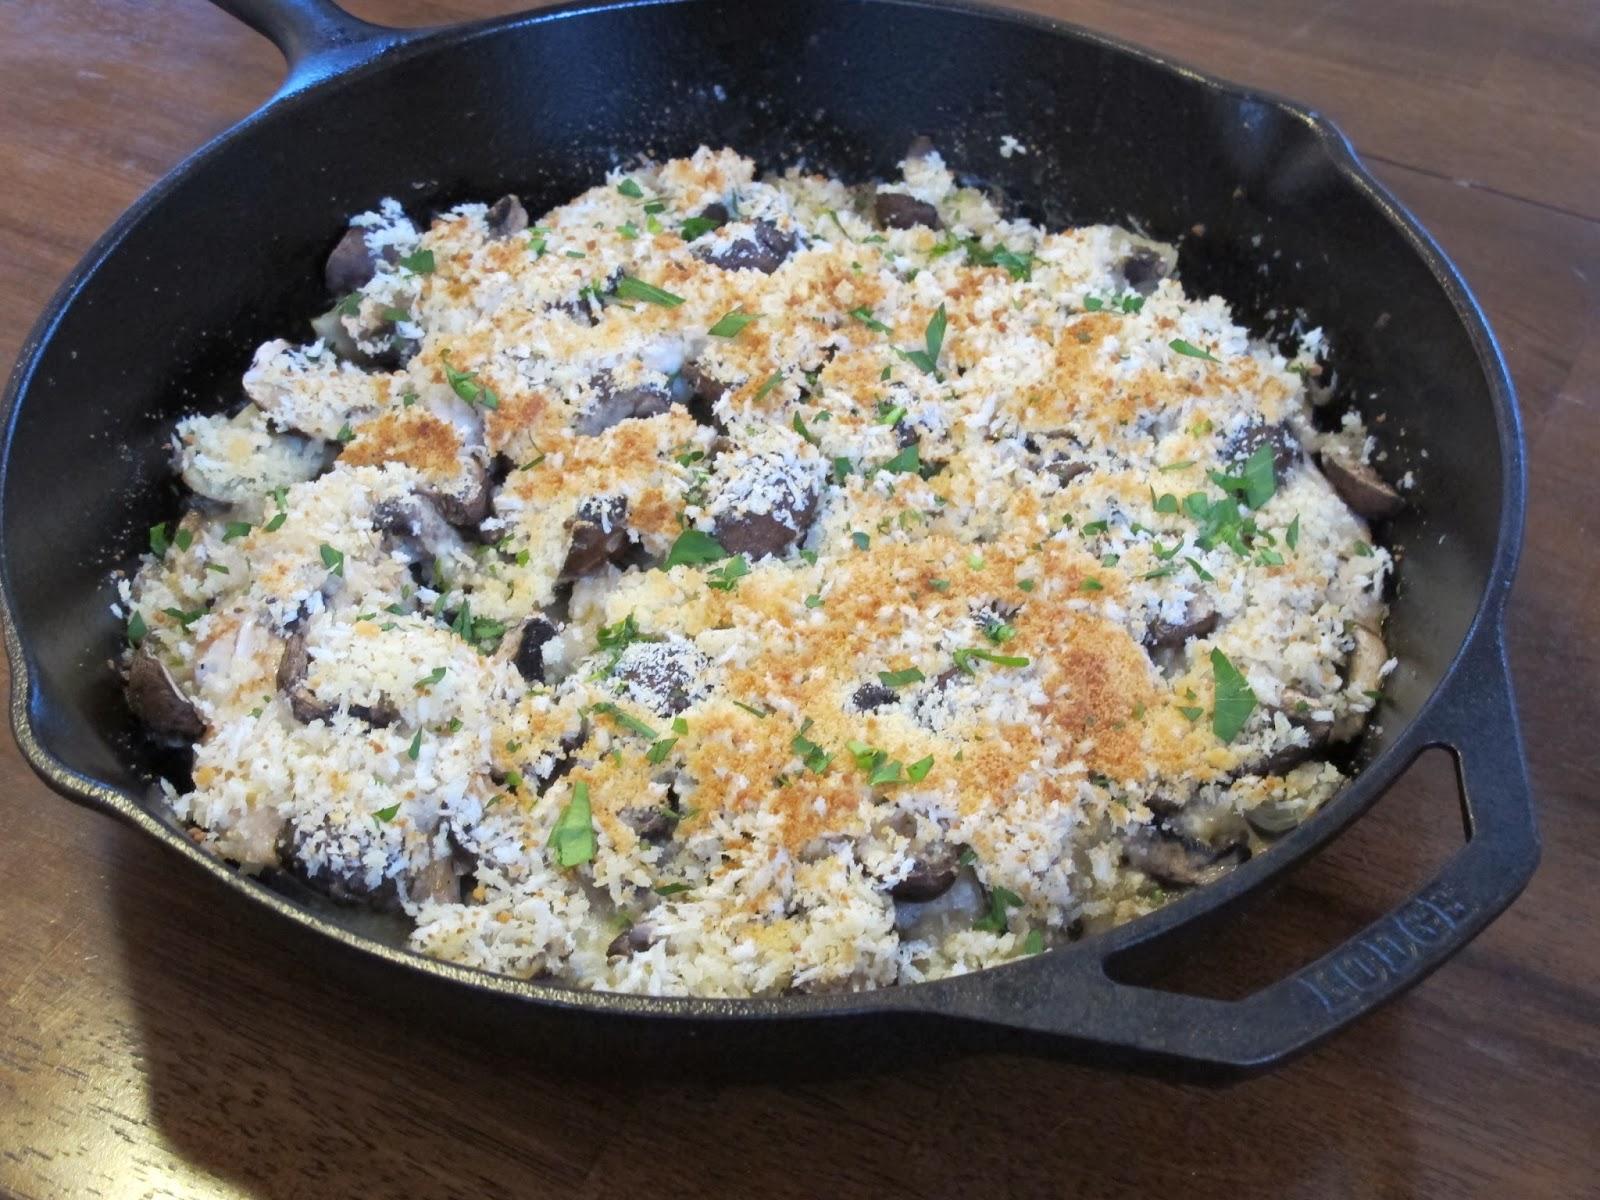 Creamy Chicken, Mushroom, & Artichoke Casserole